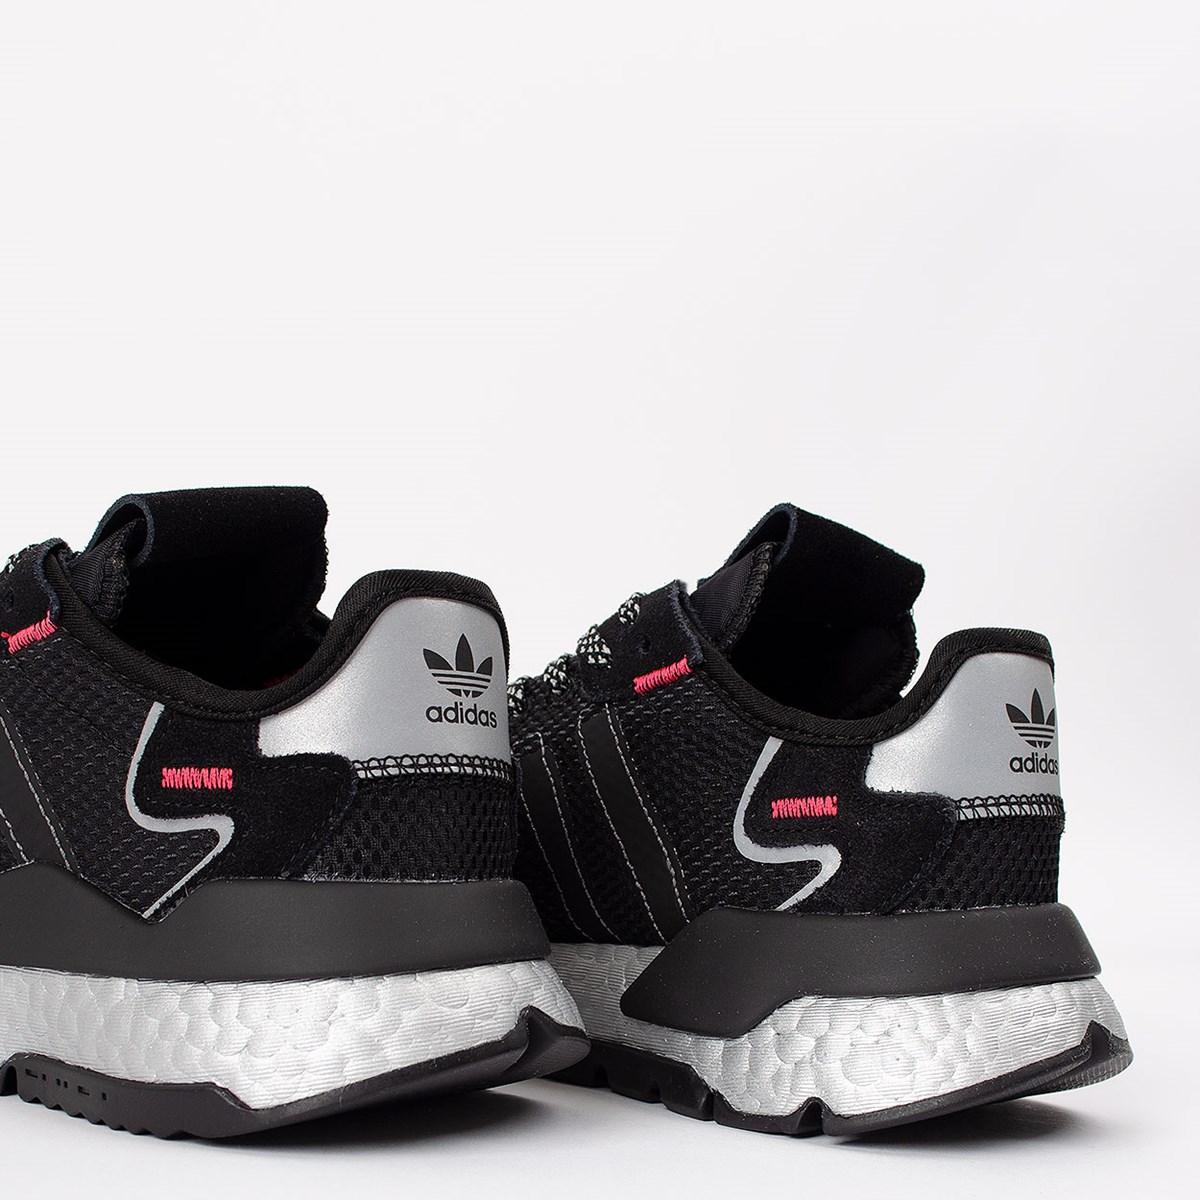 Tênis adidas Nite Jogger Core Black Silver Metallic FV4137